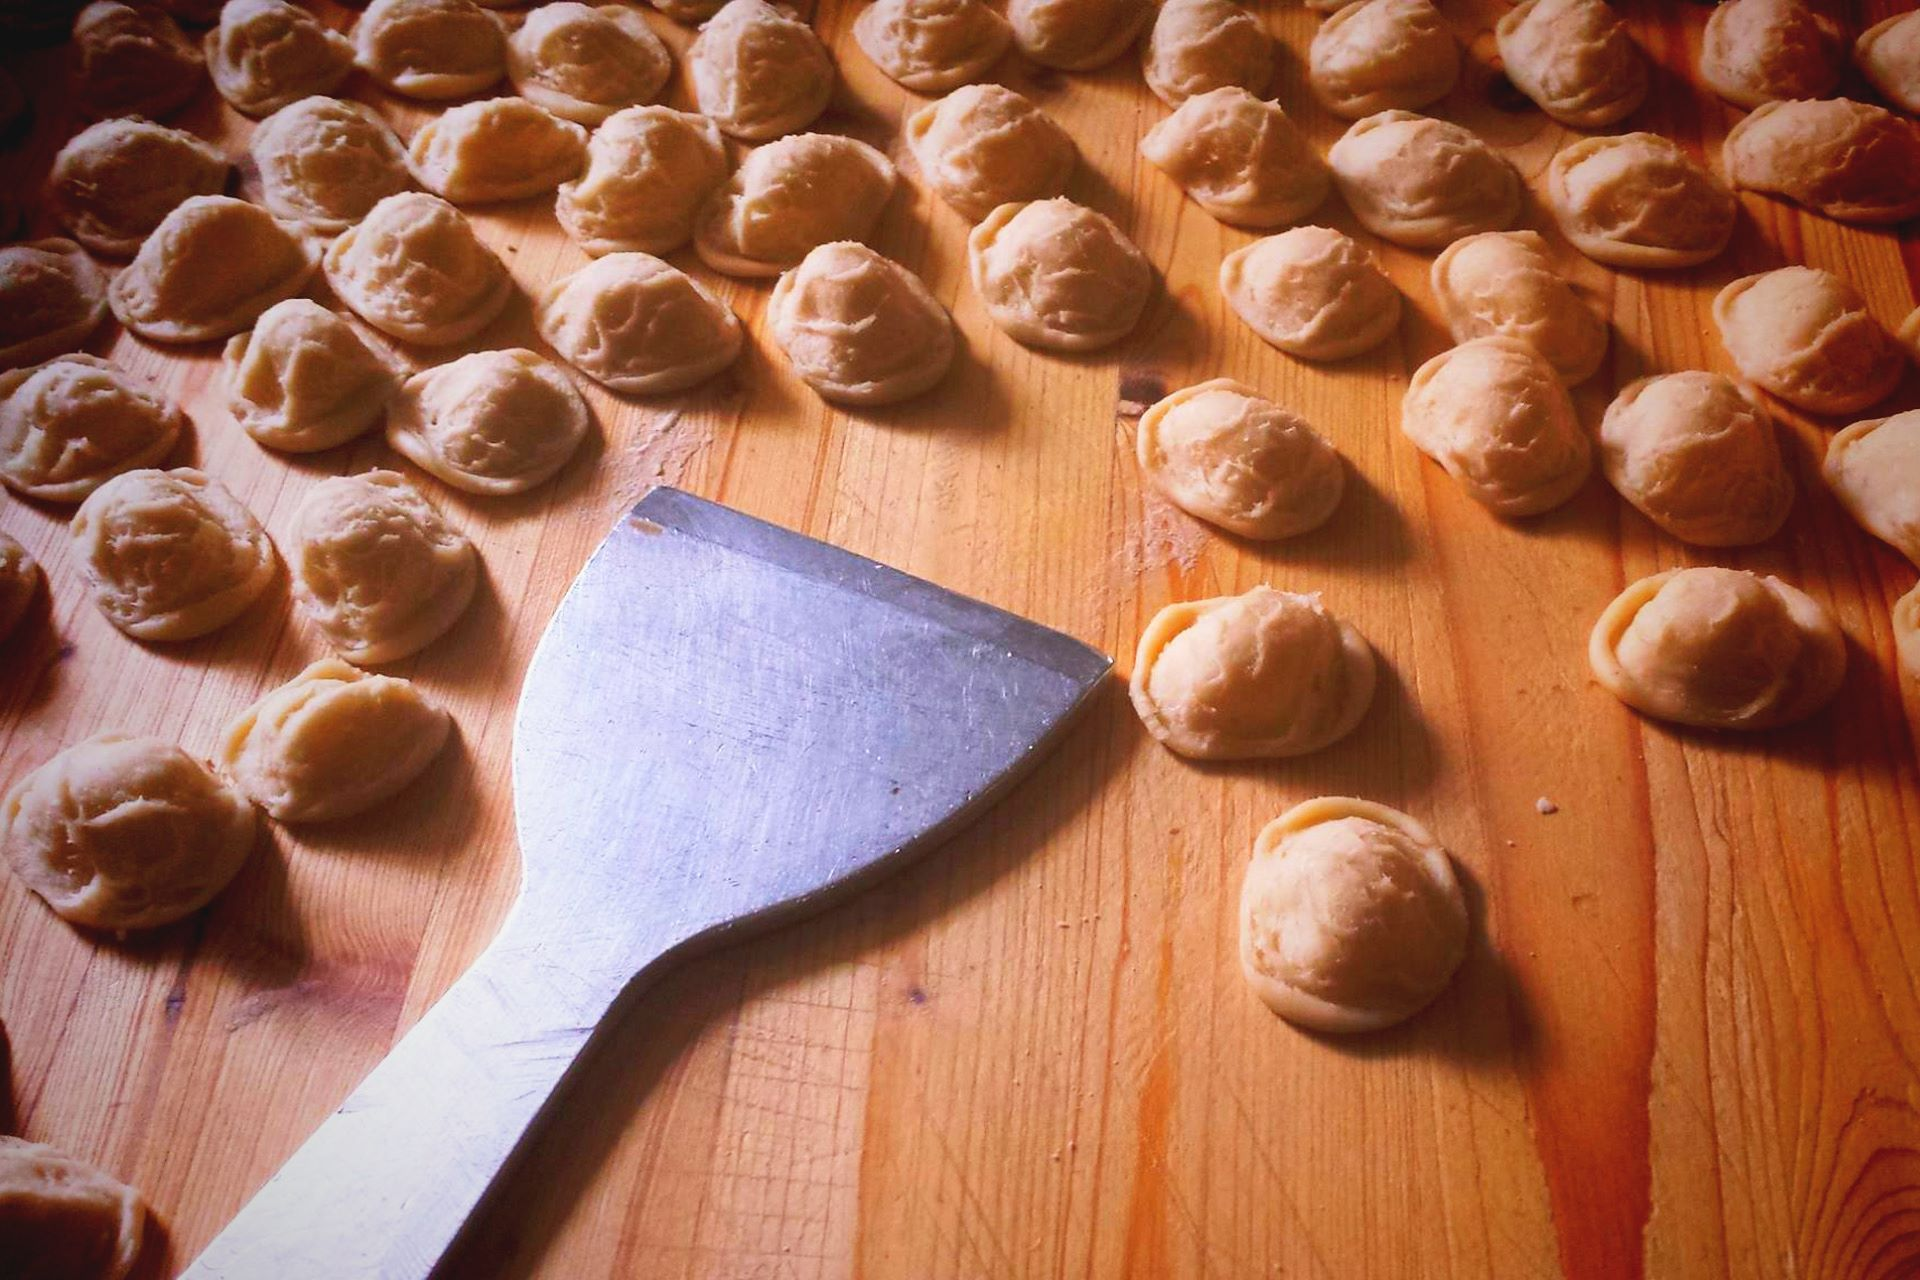 apulia-slow-travel-cooking class-orecchiette-apulia-apulien-puglia-cucina pugliese- apulian cuisine-kochkurs-apulische kueche-pasta-nudeln